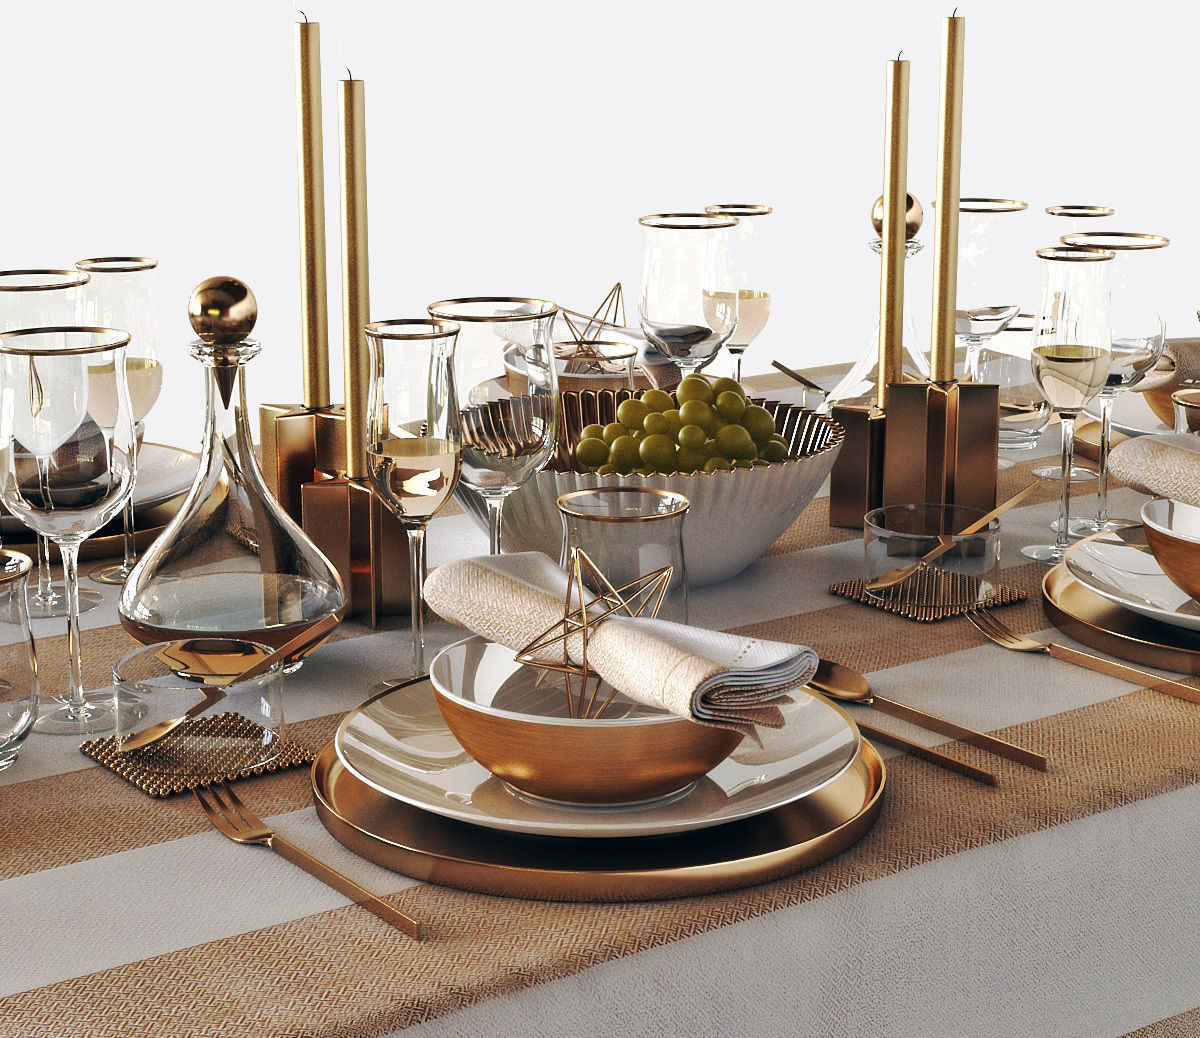 Table setting 05